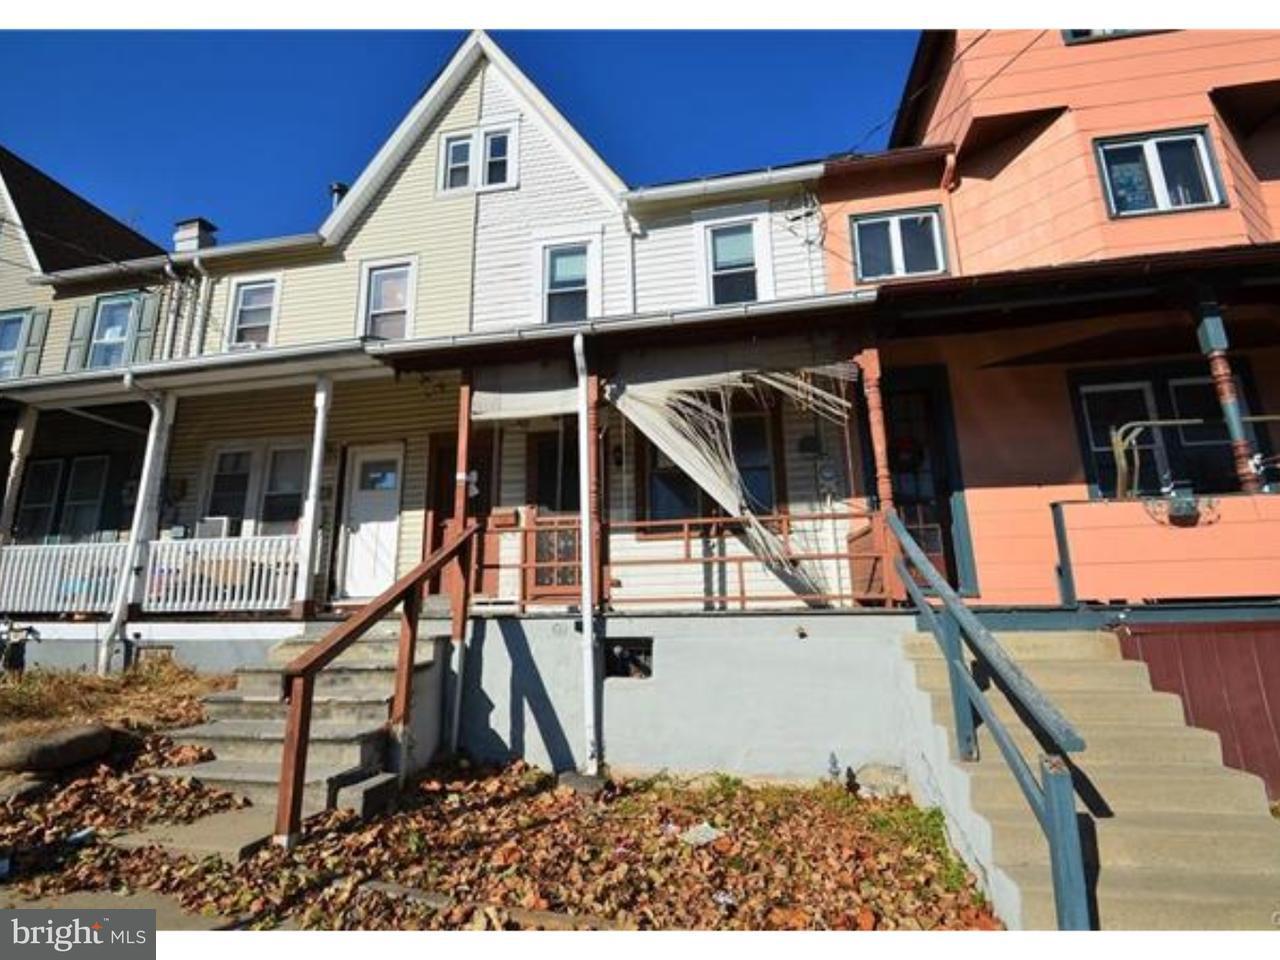 Casa unifamiliar adosada (Townhouse) por un Venta en 336 MULBERRY Street Catasauqua, Pennsylvania 18032 Estados Unidos